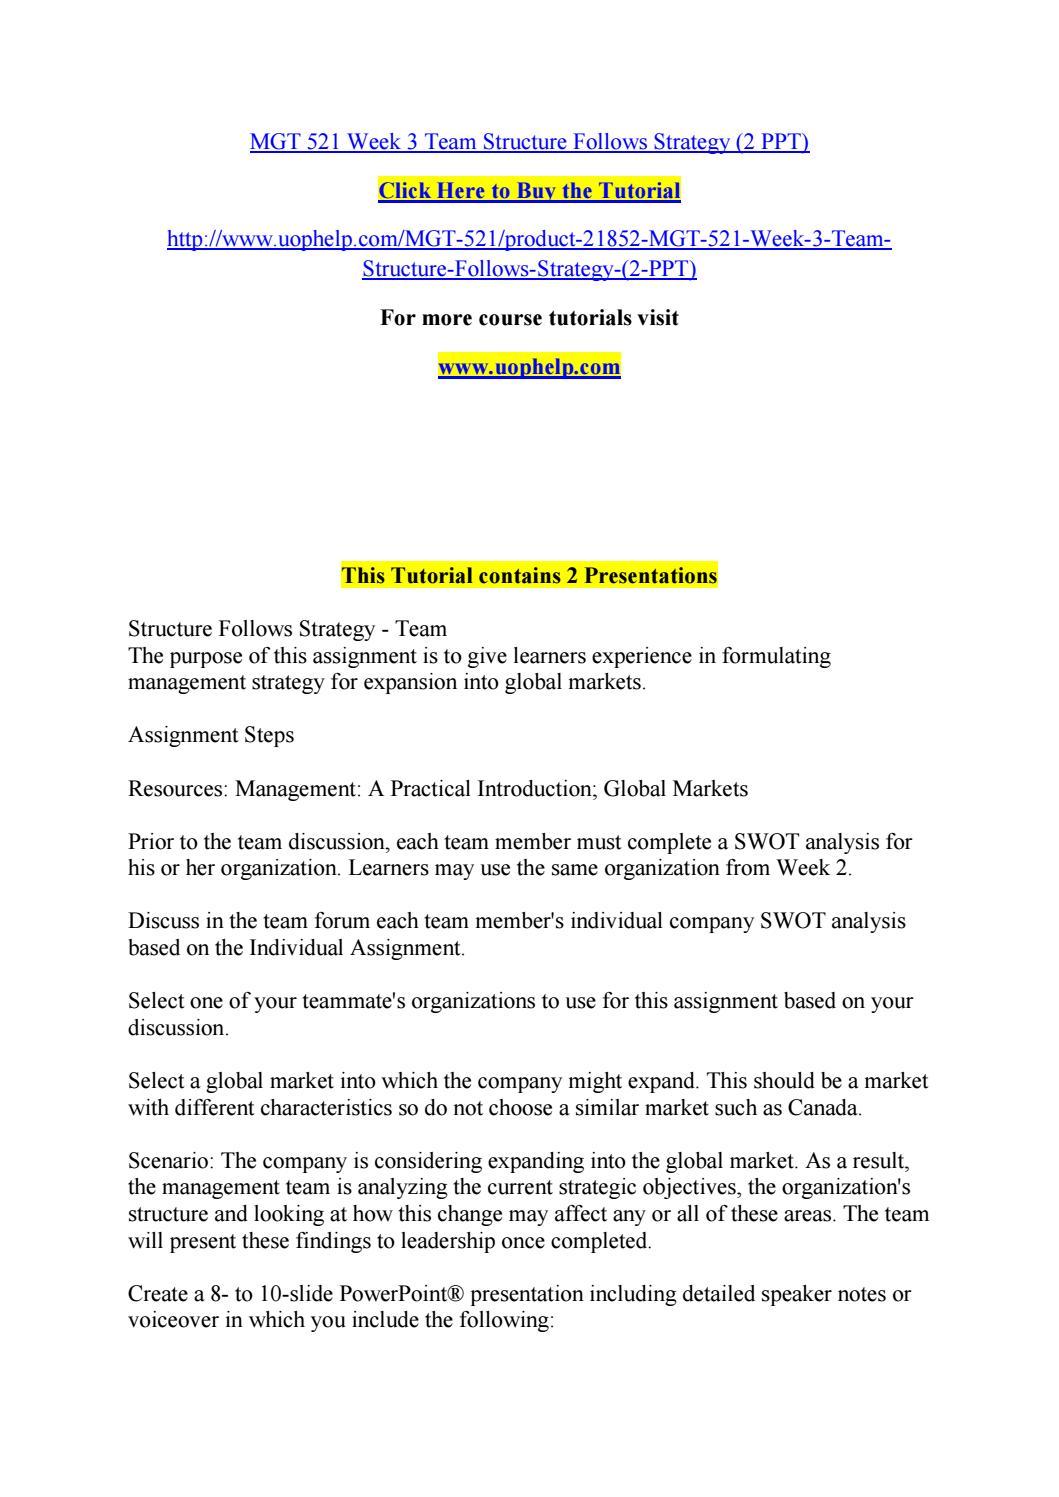 Organizational planning Paper Week 3 MGT-521